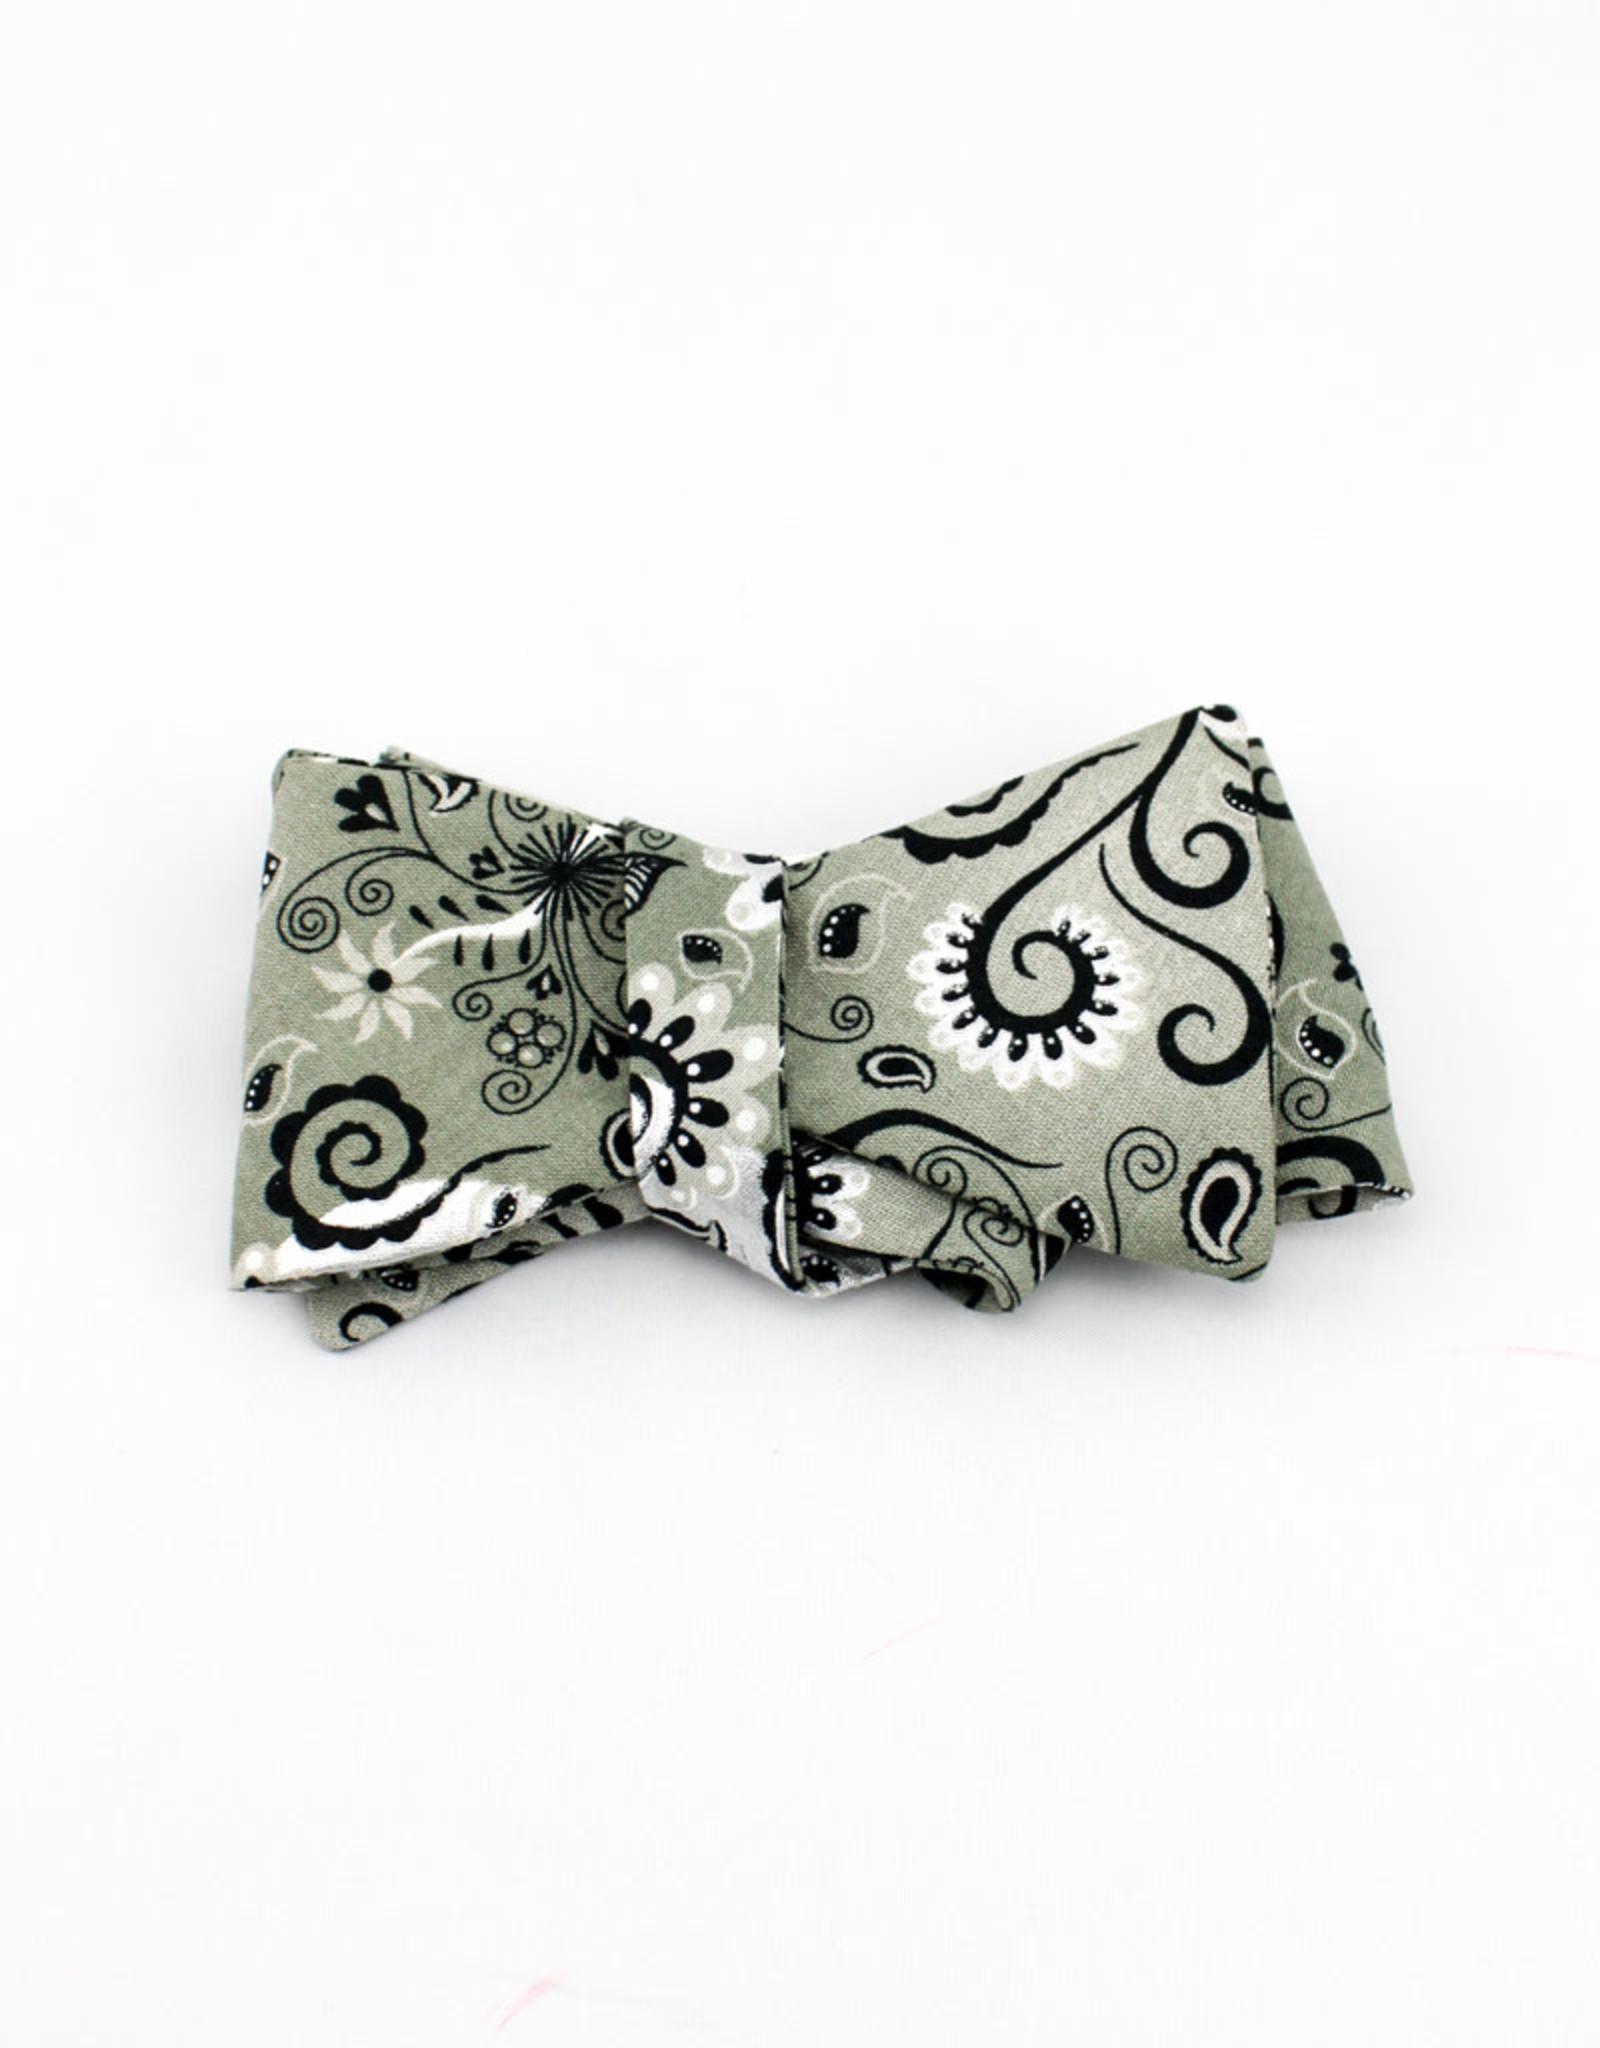 Lowe Bow Originals Handcrafted Adjustable Self Tie Bow Ties